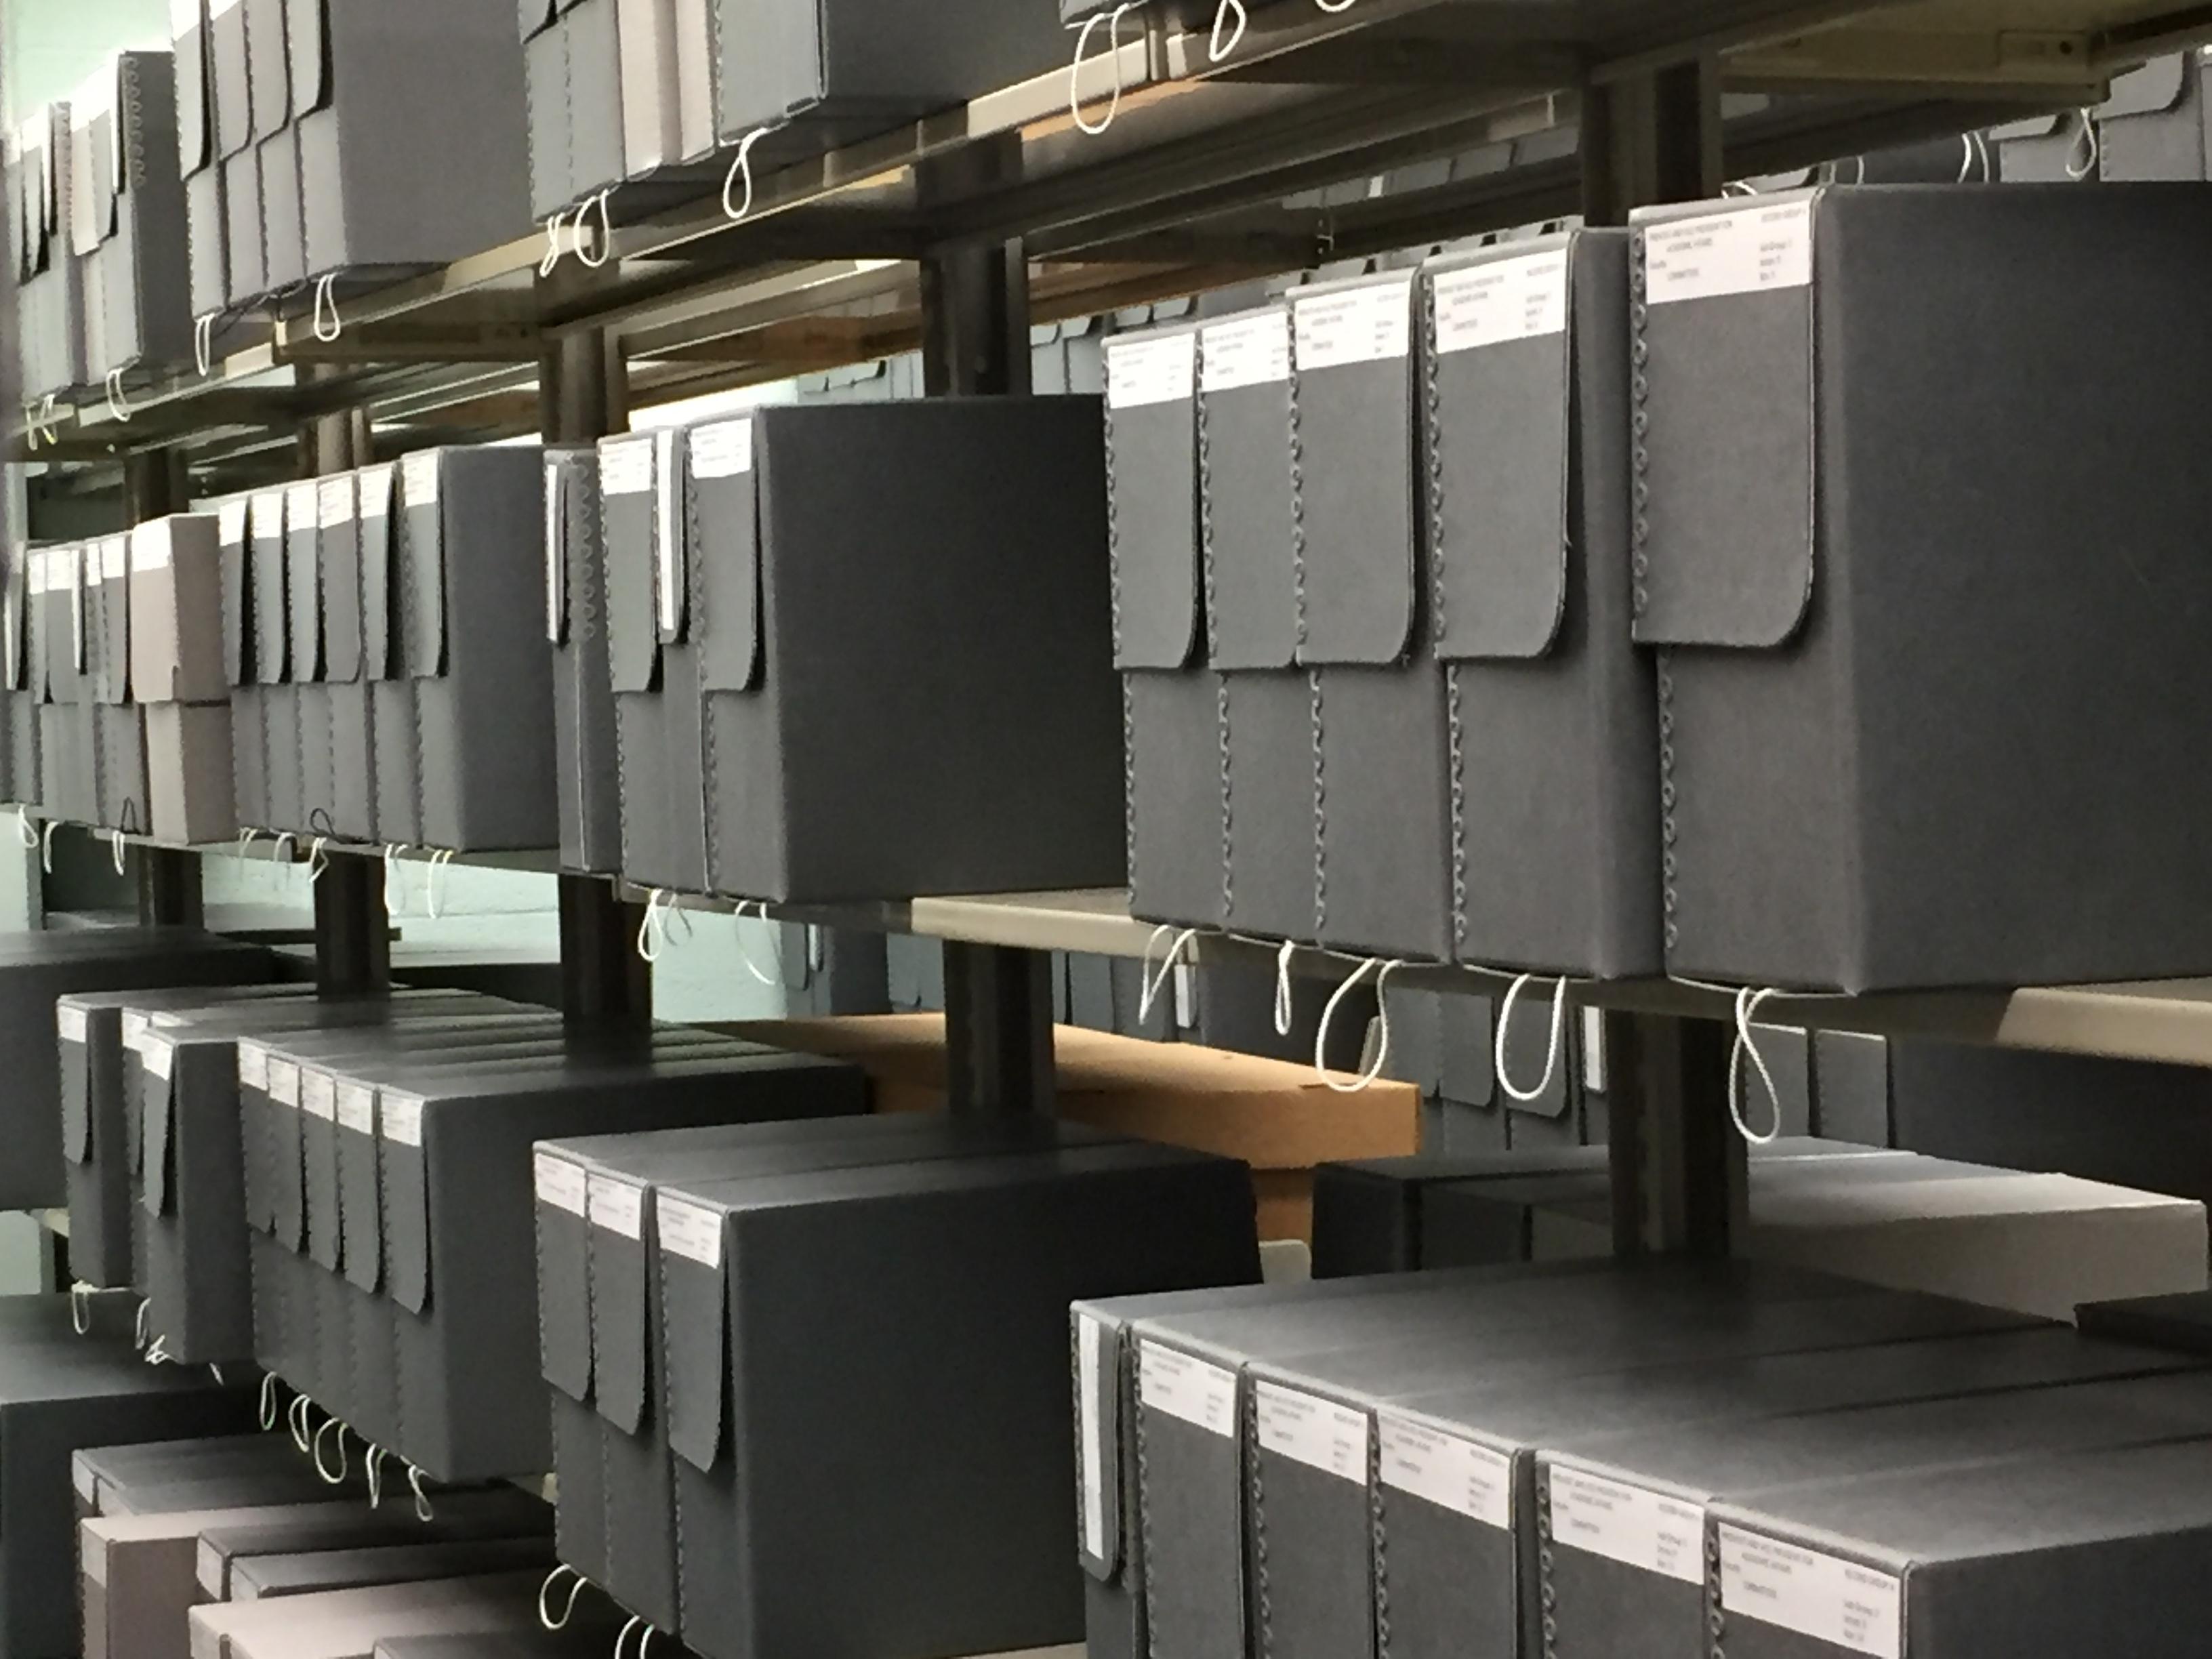 Archives storage